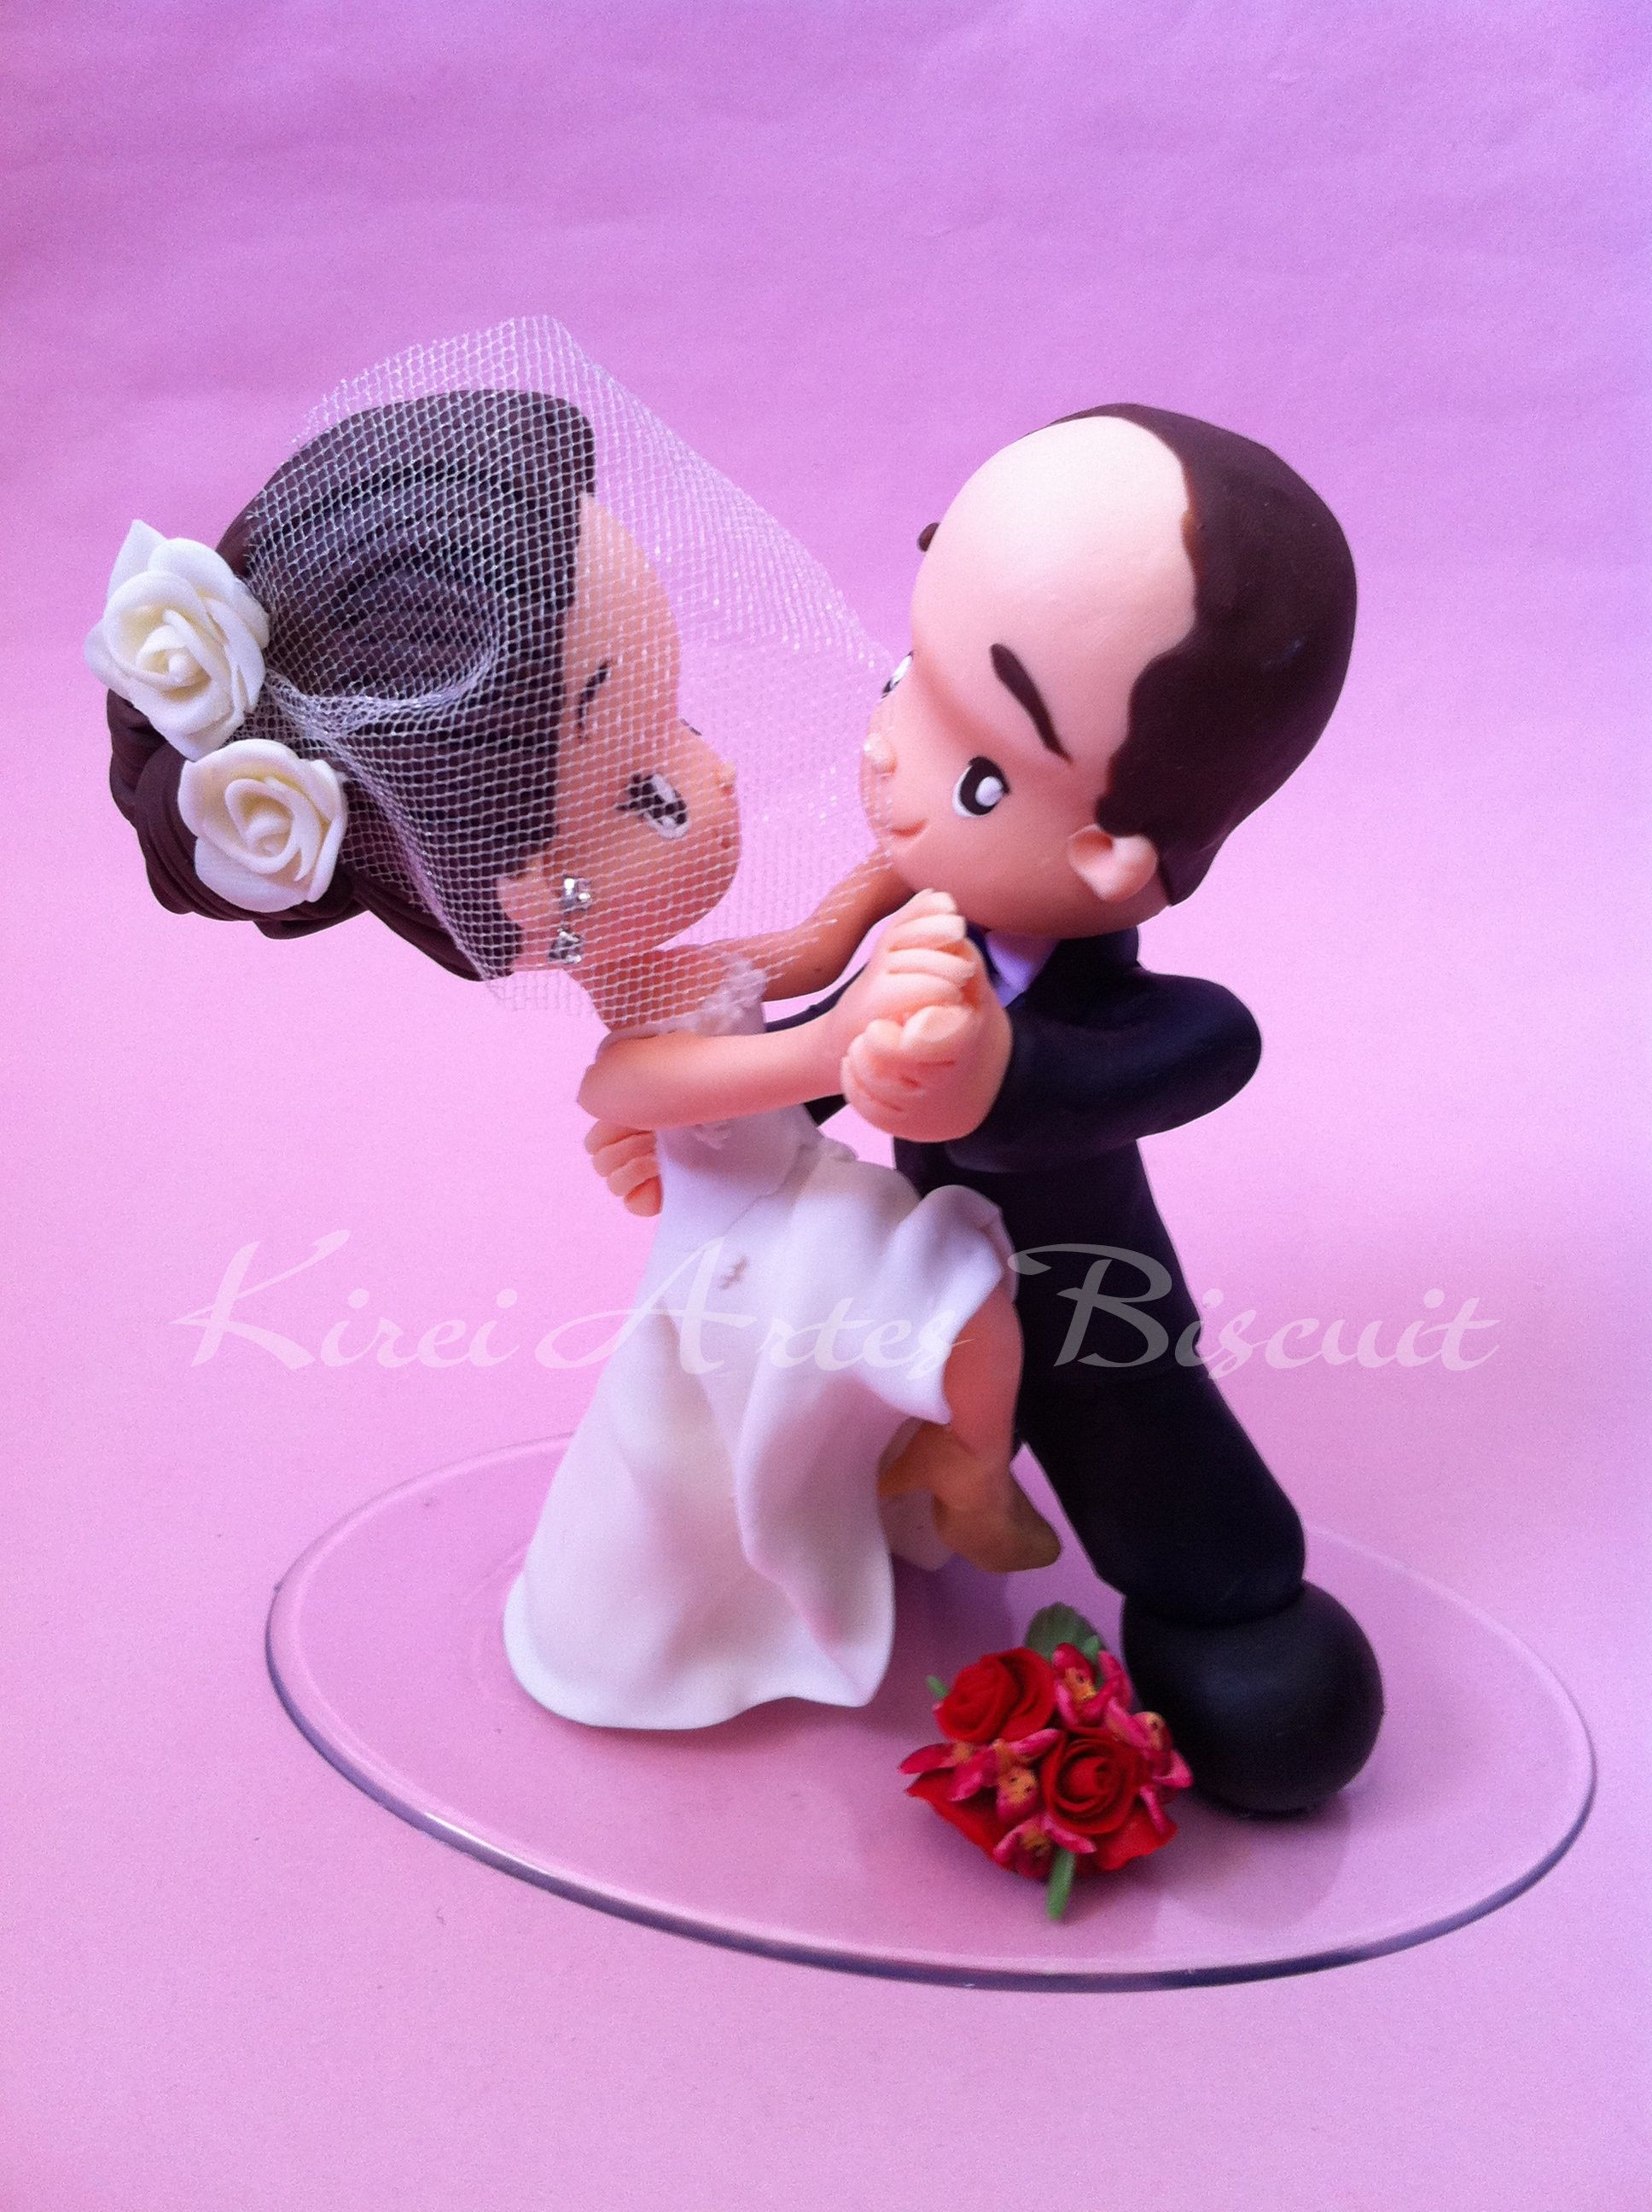 Noivinhos dançando tango | Biscuit casamento | Pinterest | Dolls